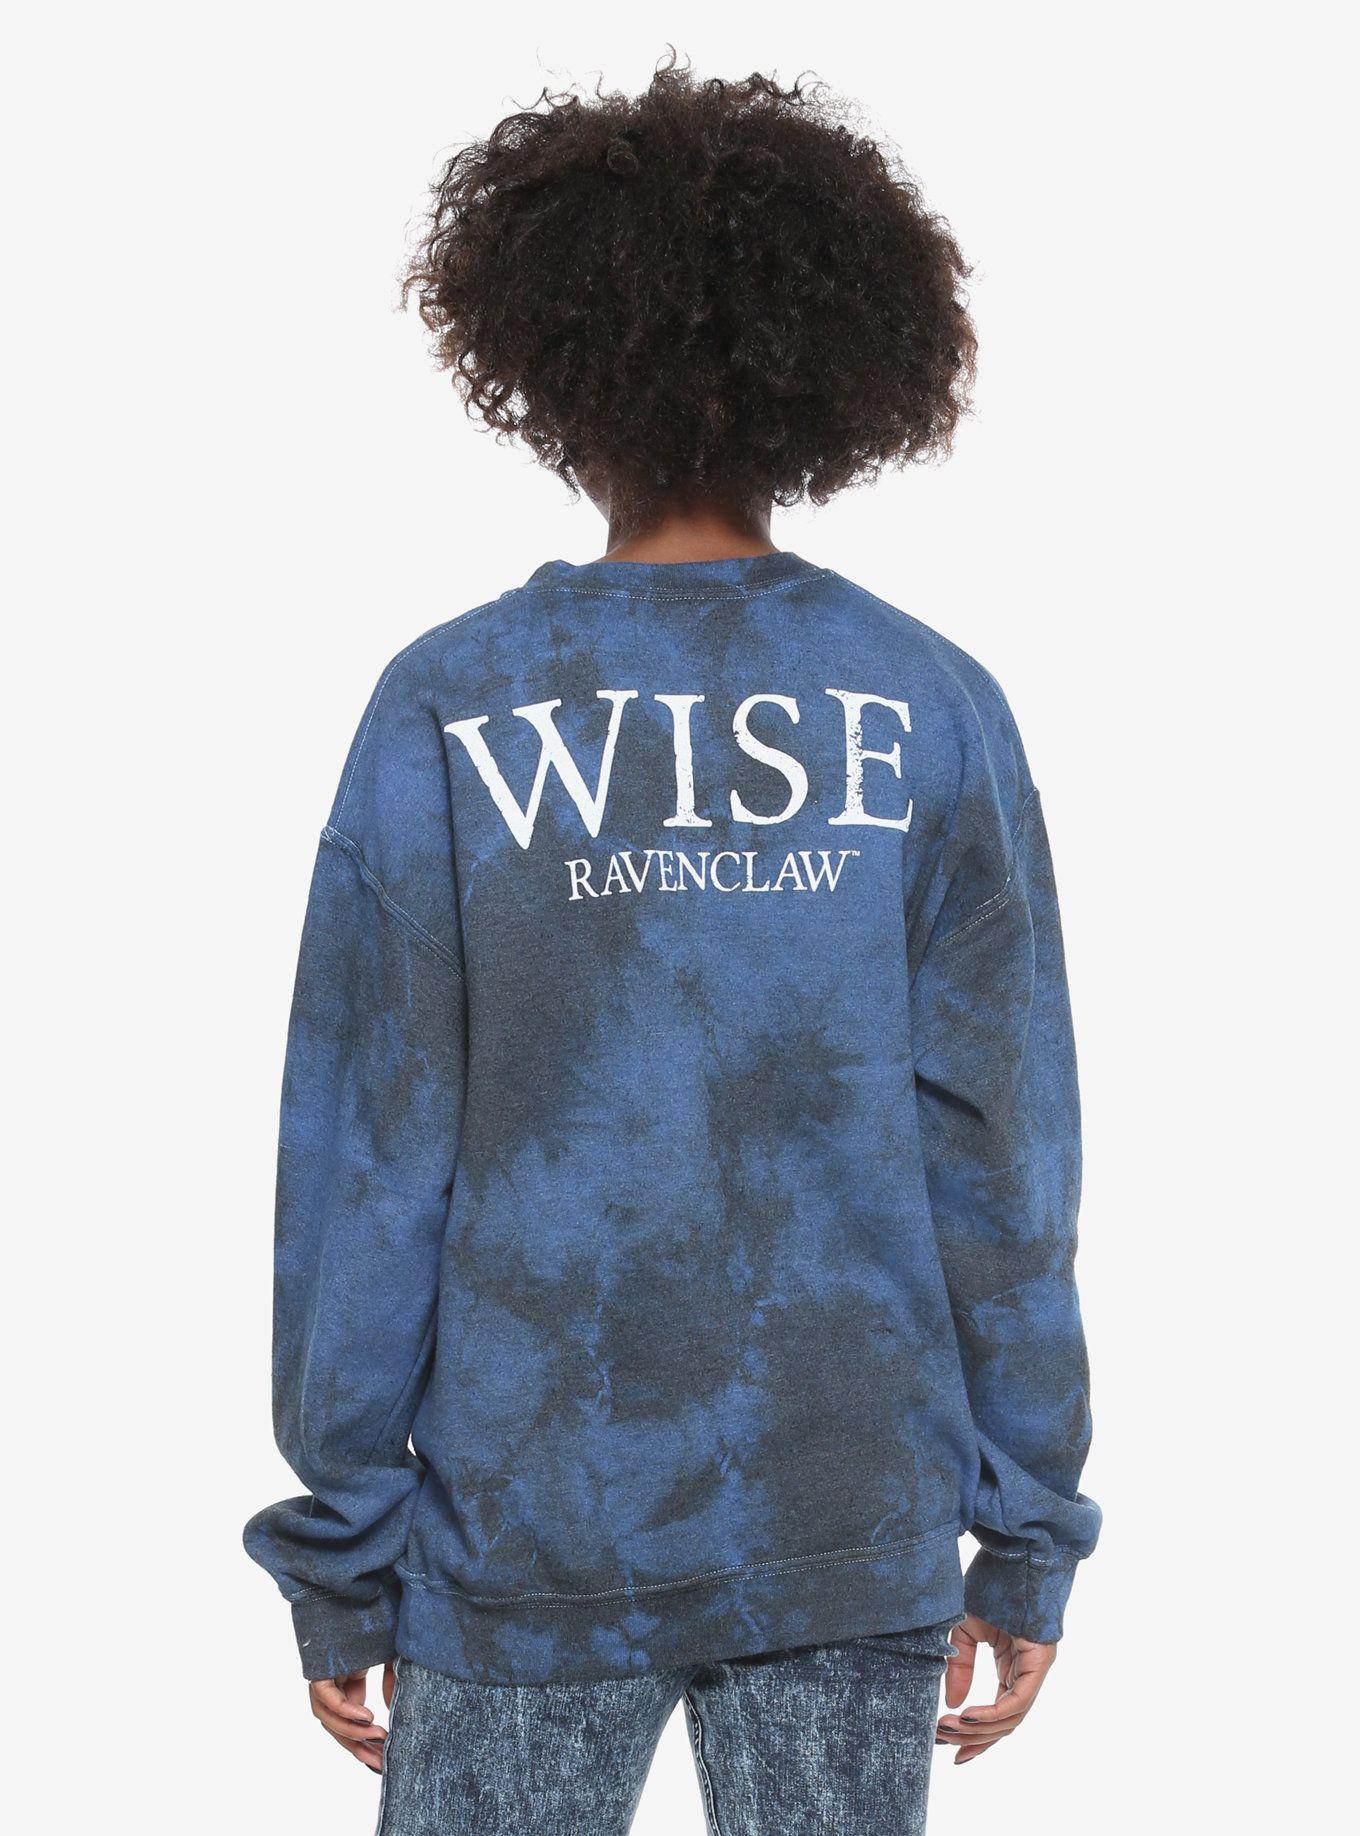 Harry Potter Ravenclaw Wise Girls Sweatshirt Girl Sweatshirts Ravenclaw Harry Potter Ravenclaw [ 1836 x 1360 Pixel ]